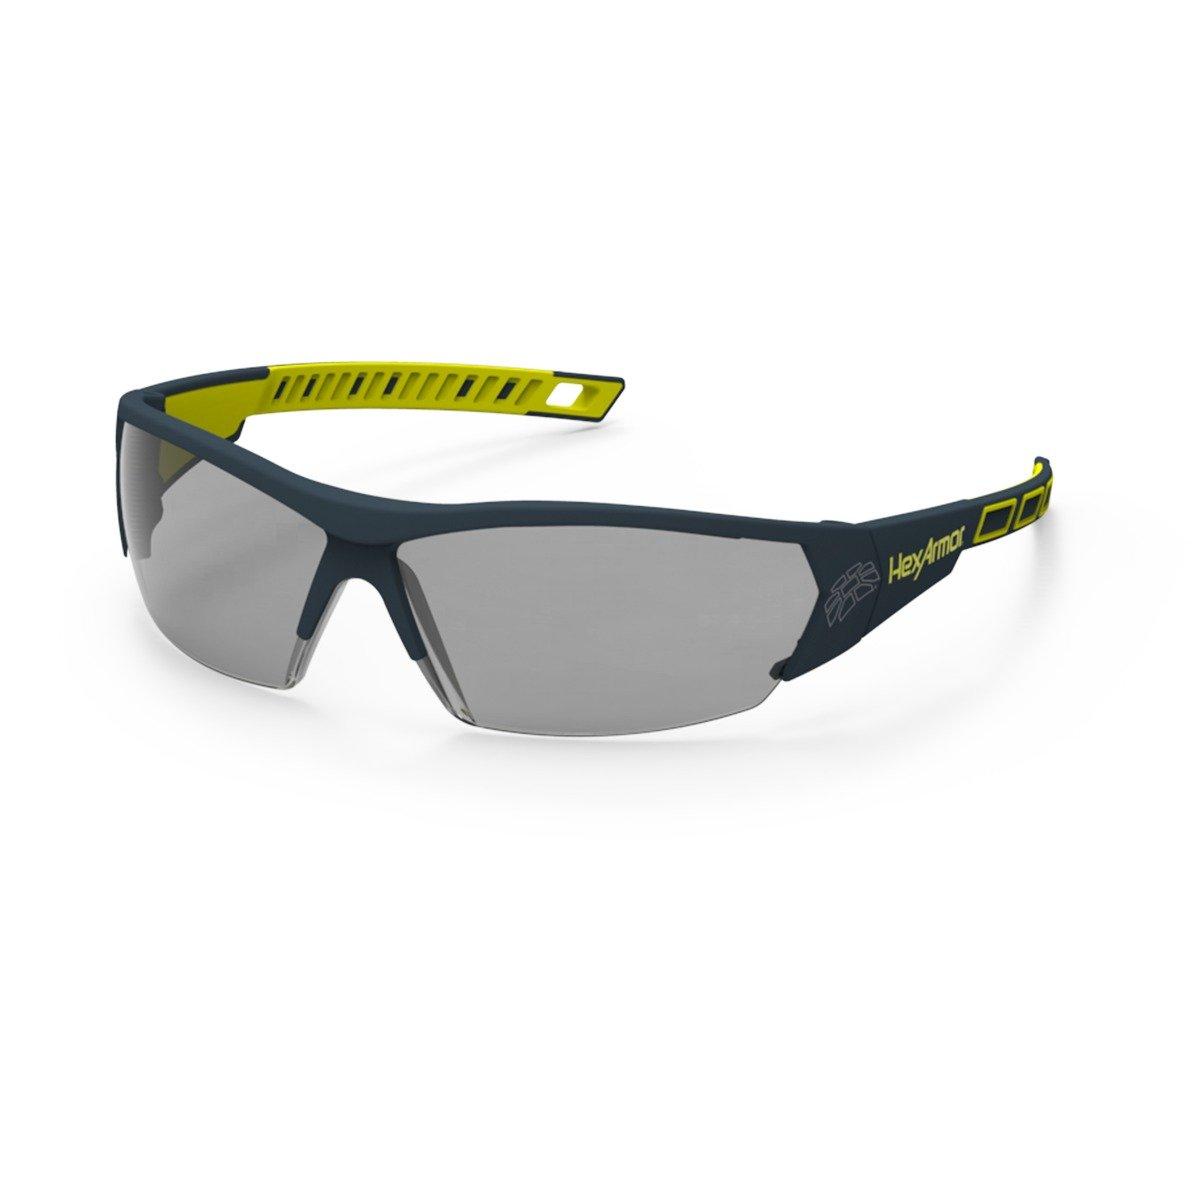 MX250 Lightweight Grey Tint Anti Fog Safety Glasses